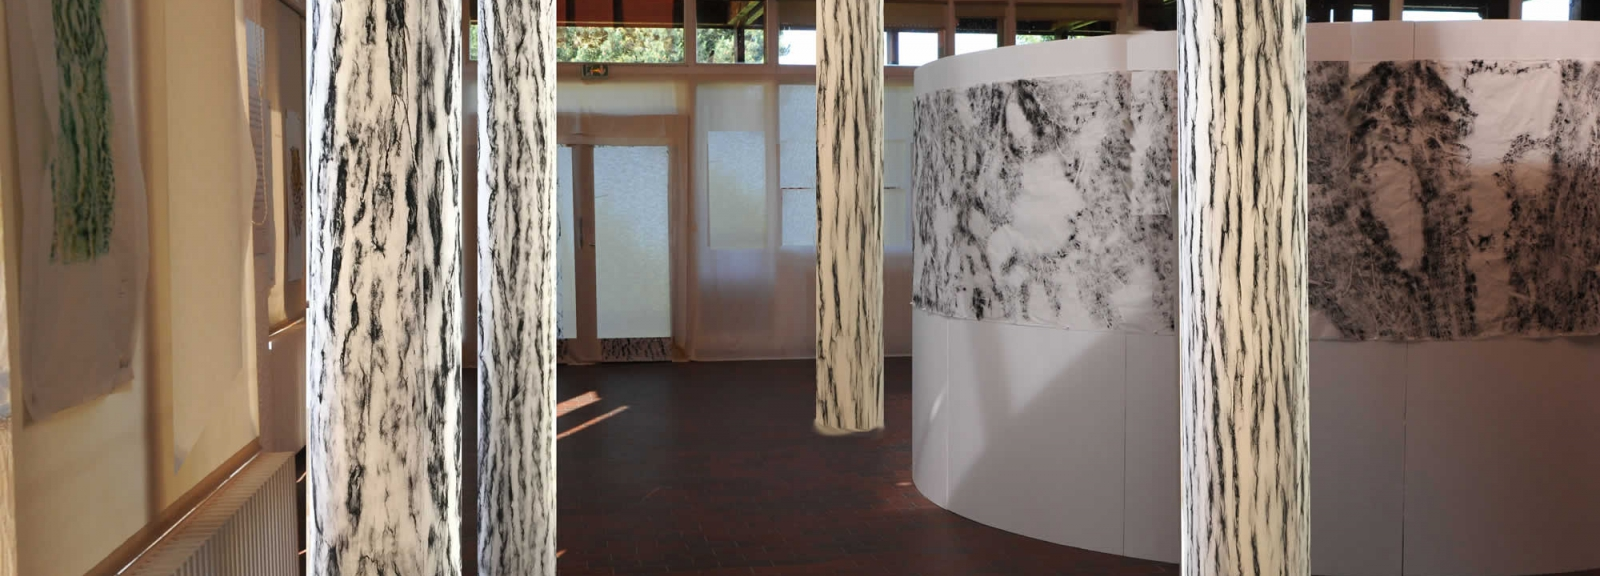 Installation de l'exposition ARBOR © C. Fulda